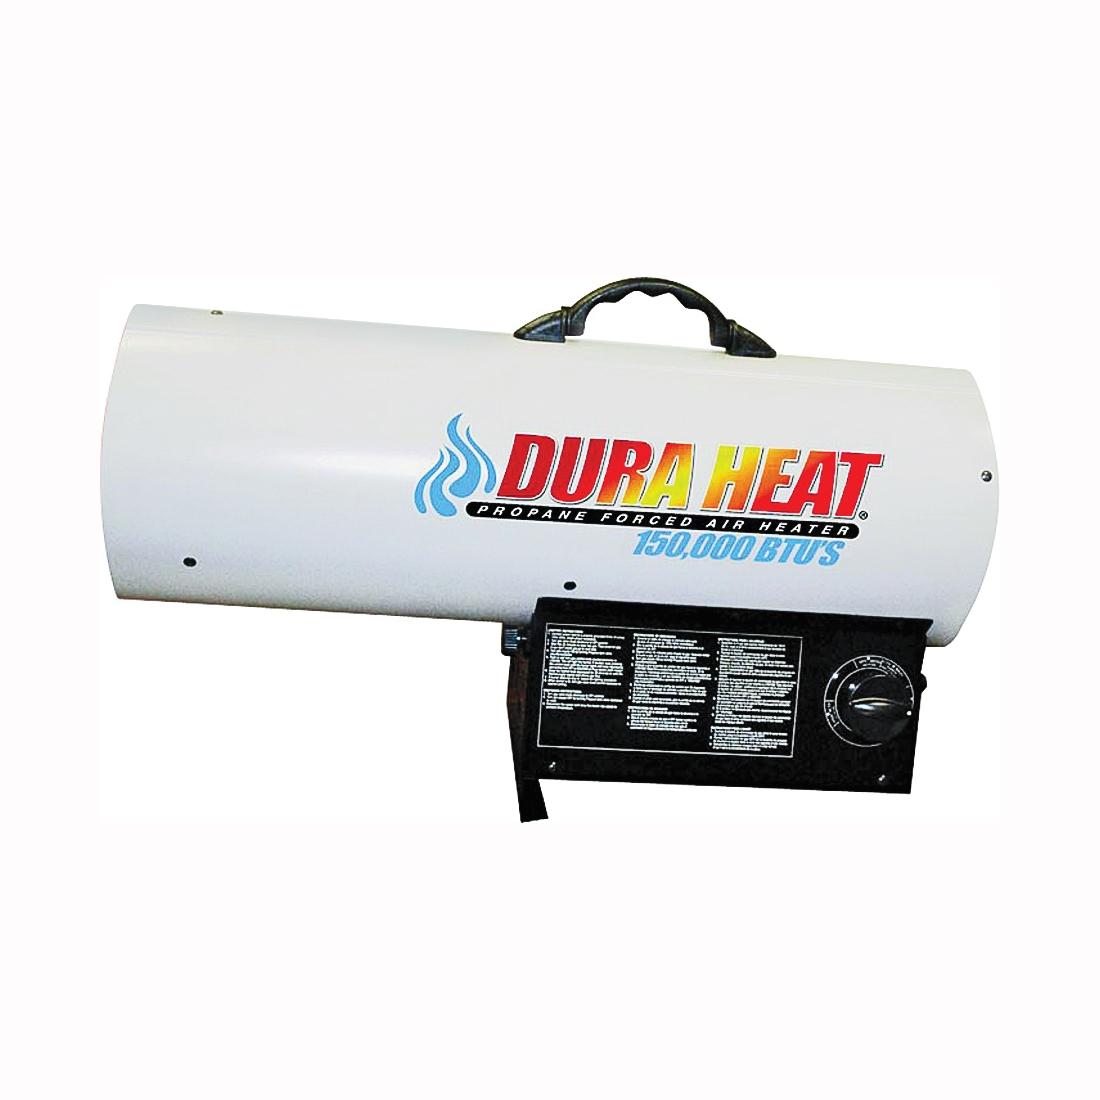 Picture of Dura Heat GFA150A Forced Air Heater, 100 lb Fuel Tank, Liquid Propane, 120000/135000/150000 Btu, 99 % Efficiency